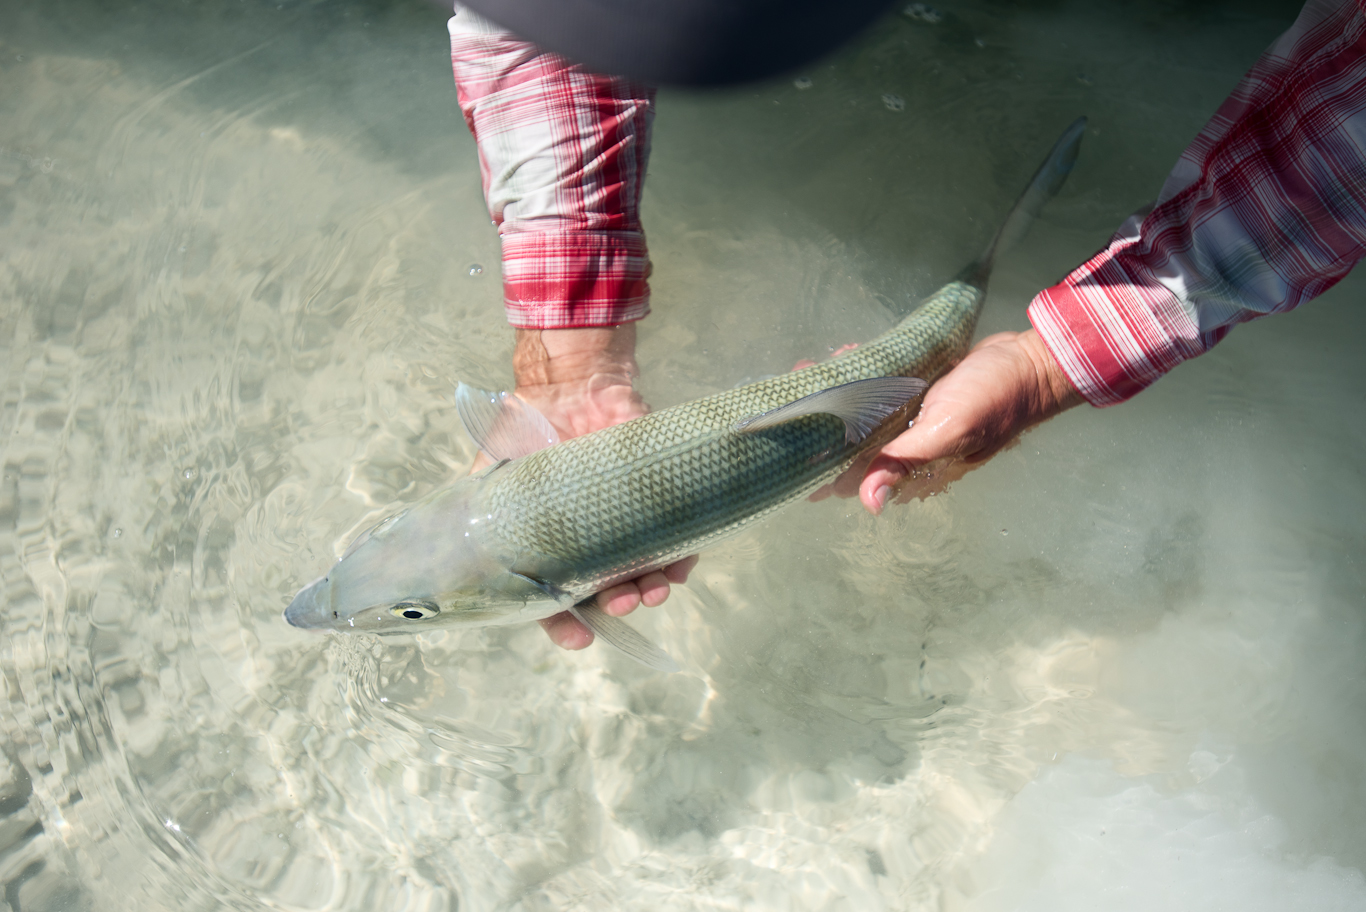 Bonefish, Bahamas, South Andros, Flyfishing